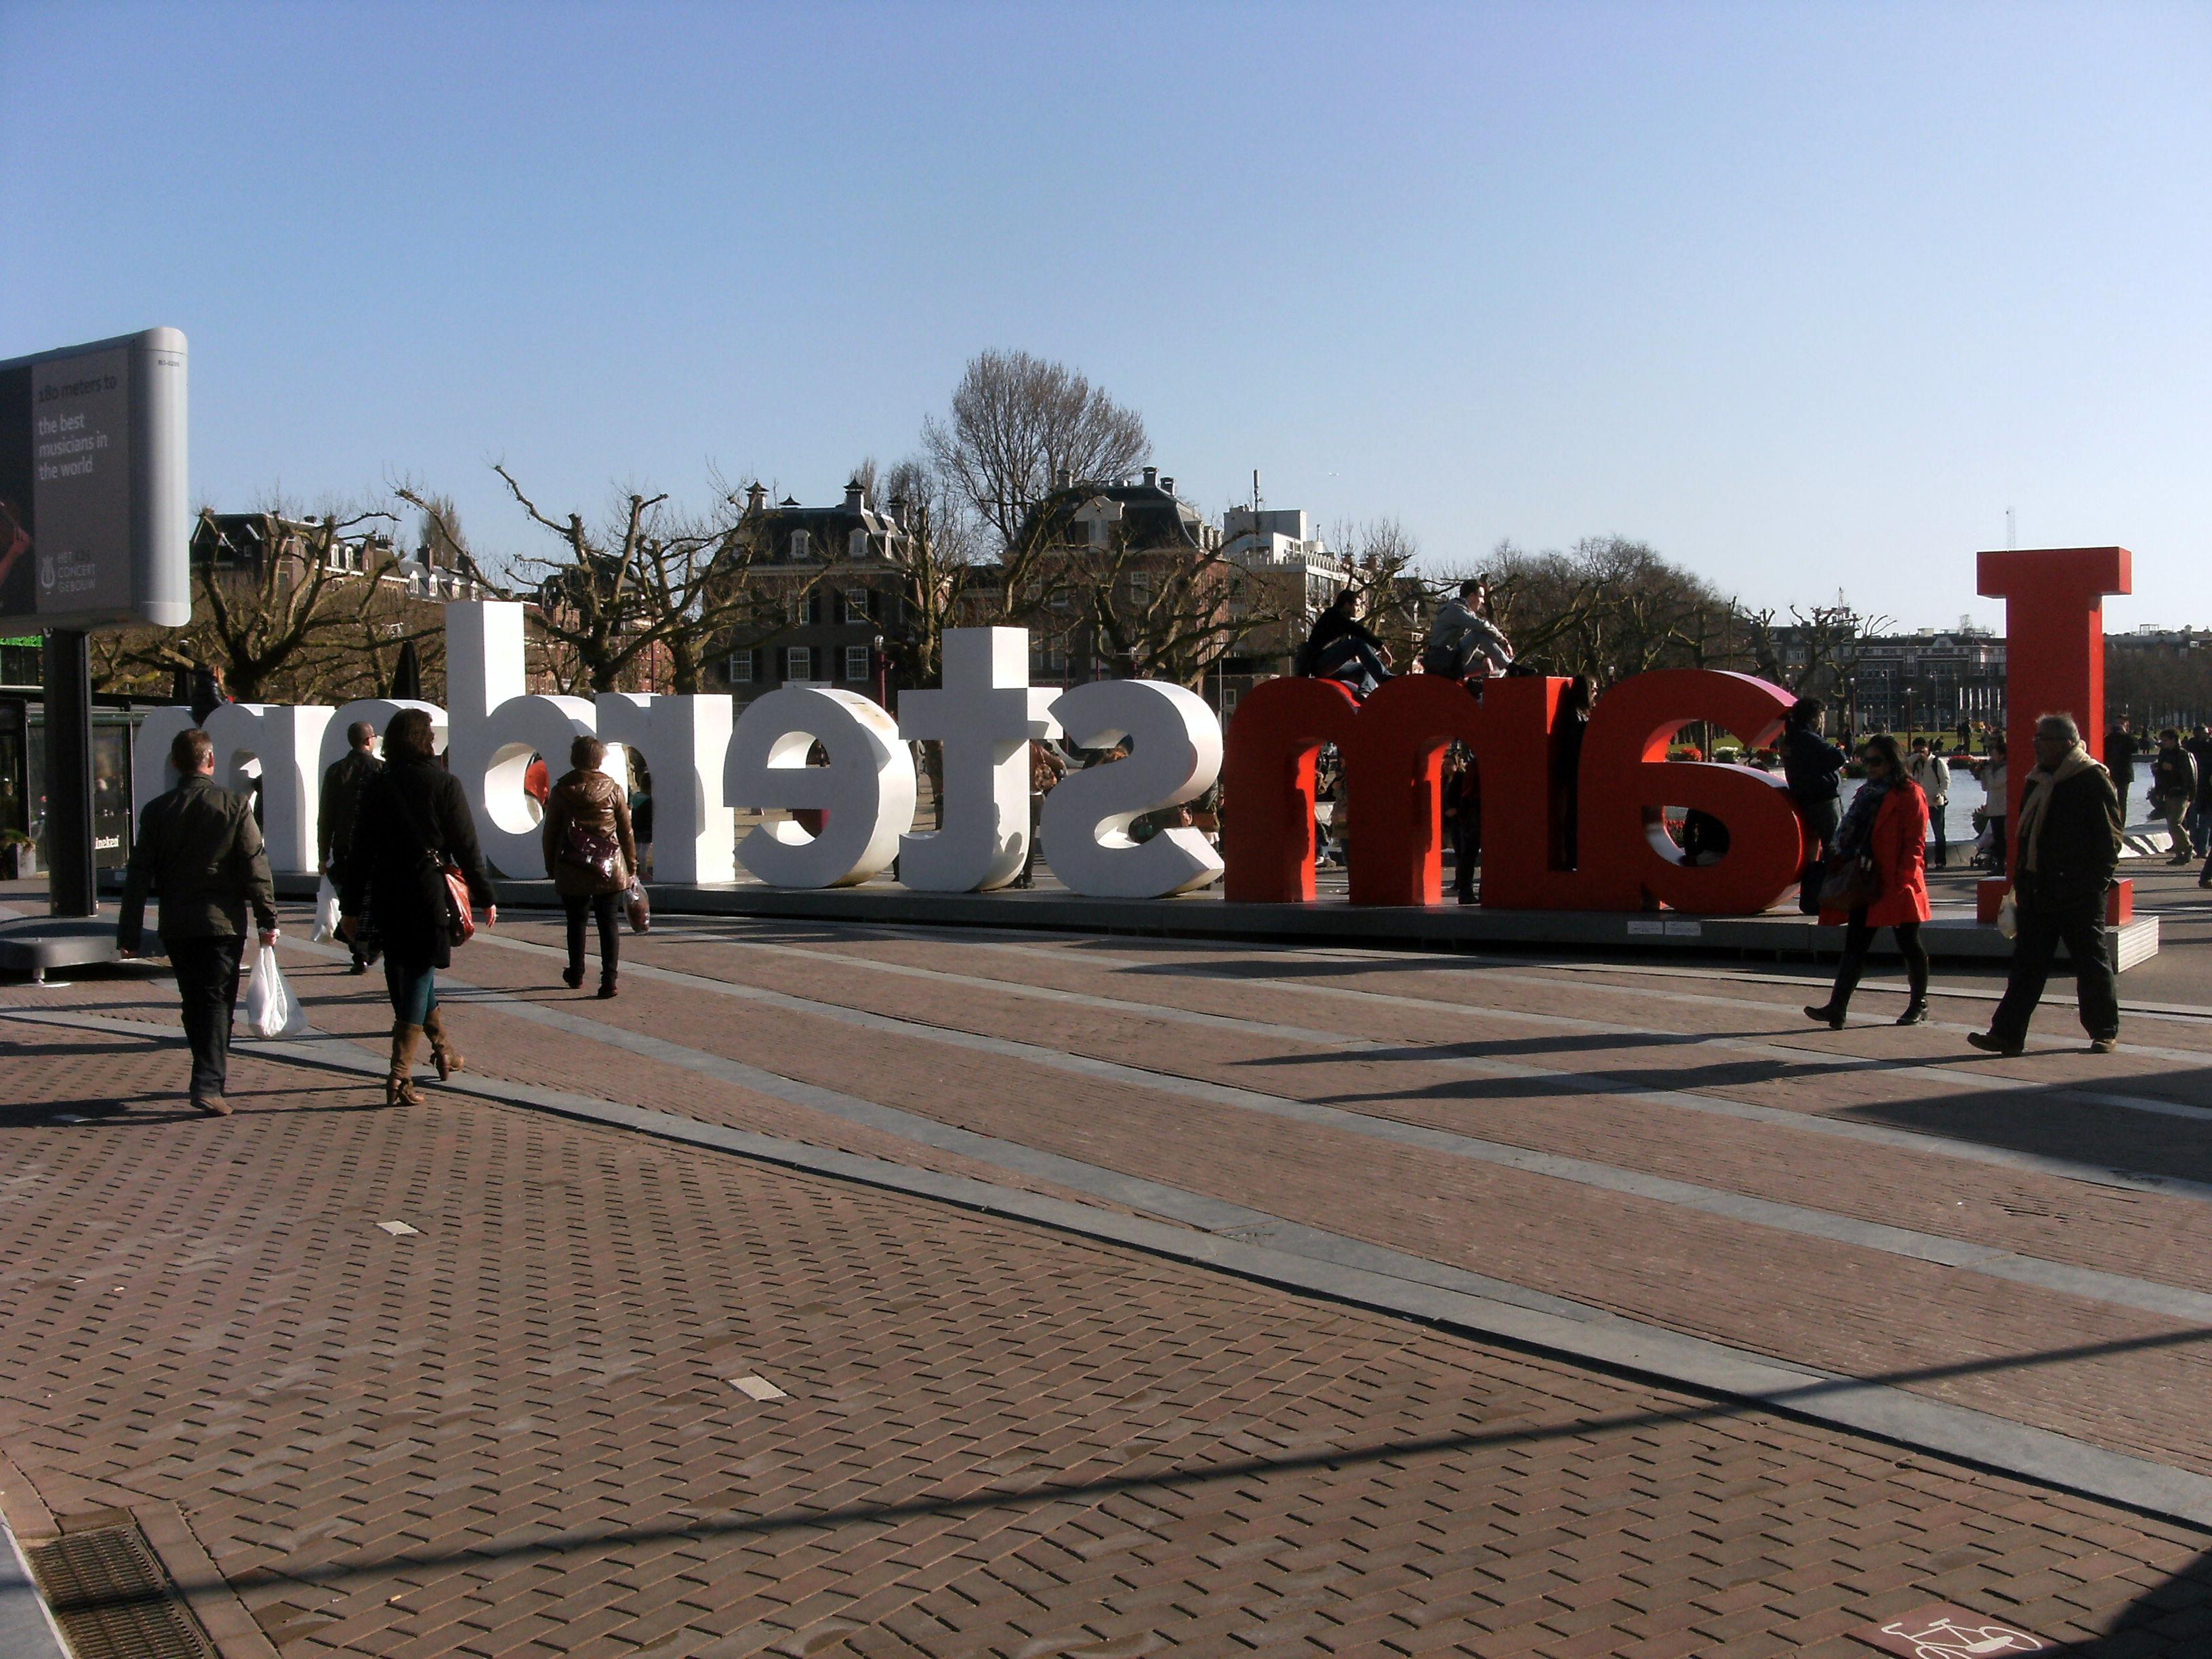 File:20130420 Amsterdam 28 I Amsterdam logo at Museumplein.JPG ...